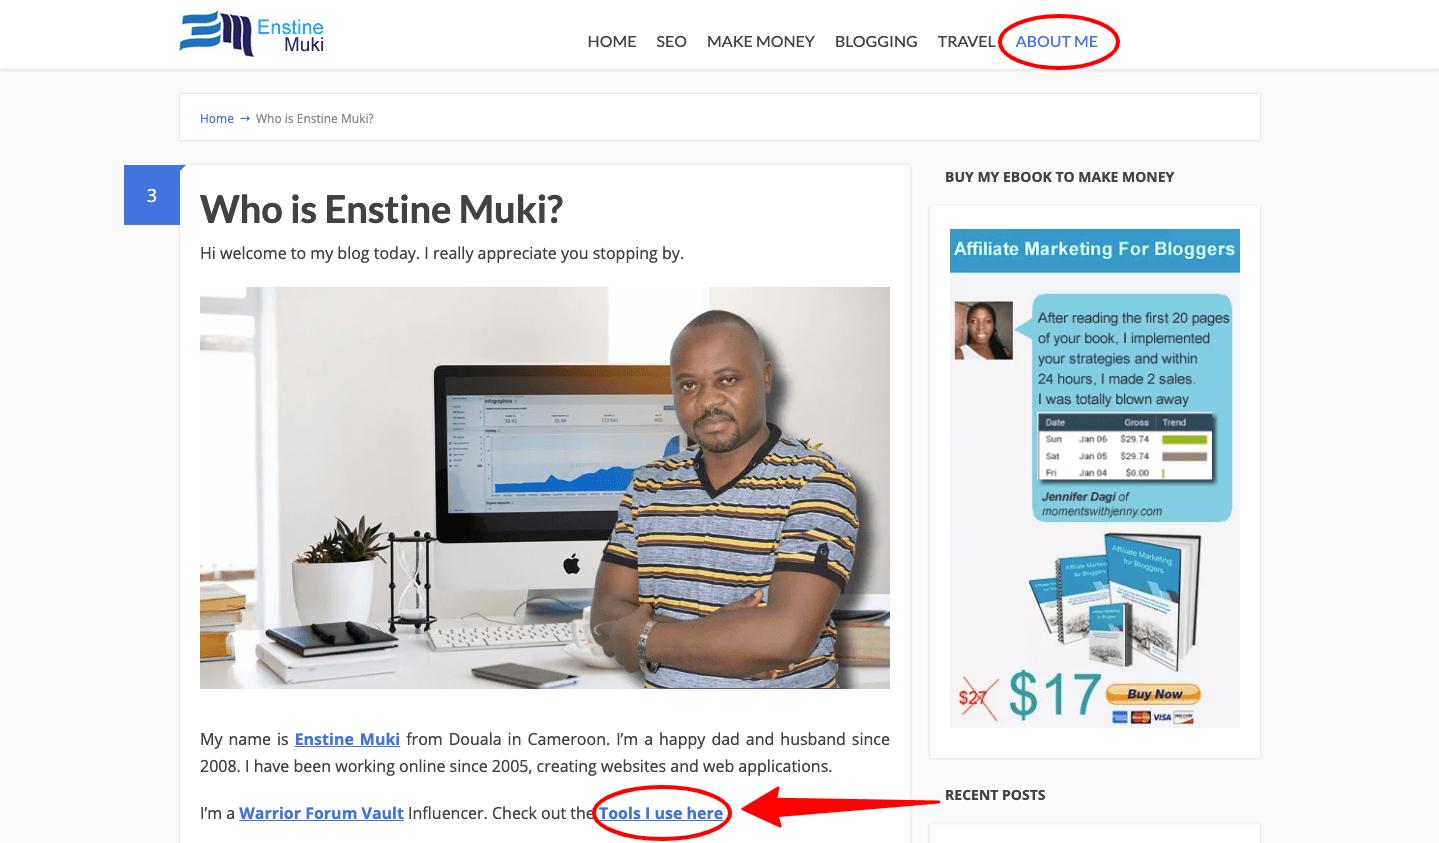 Who is Enstine Muki